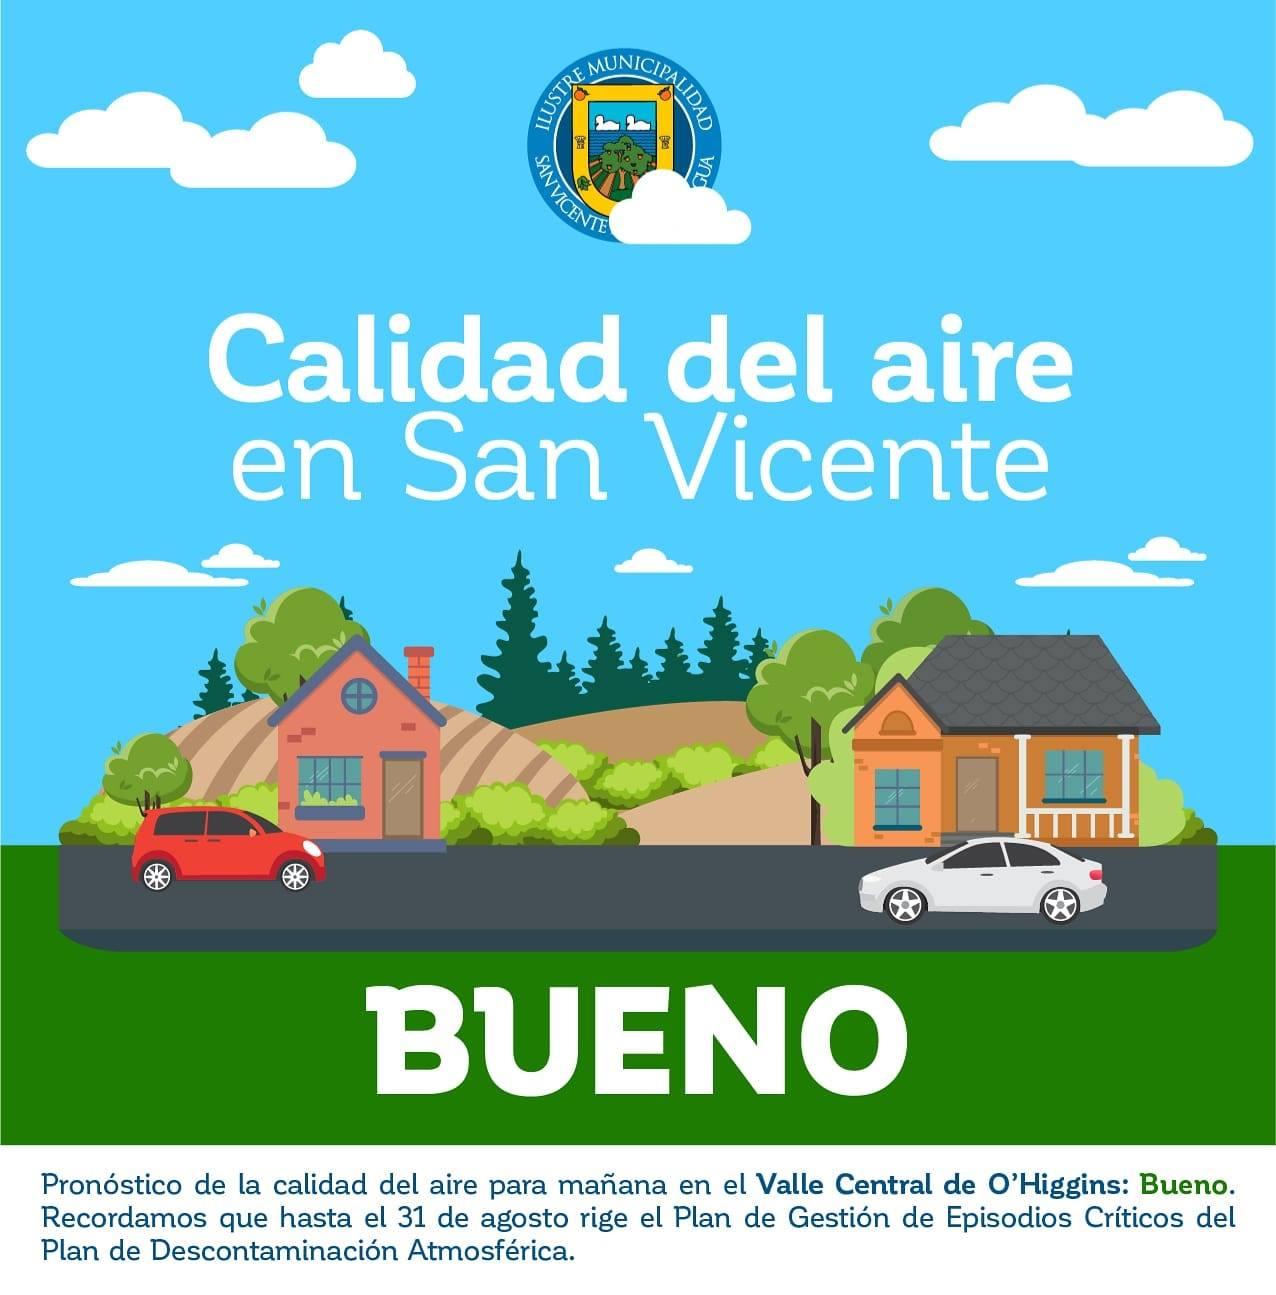 CALIDAD DEL AIRE EN SAN VICENTE DE TAGUA TAGUA MARTES 28 DE ABRIL: BUENO